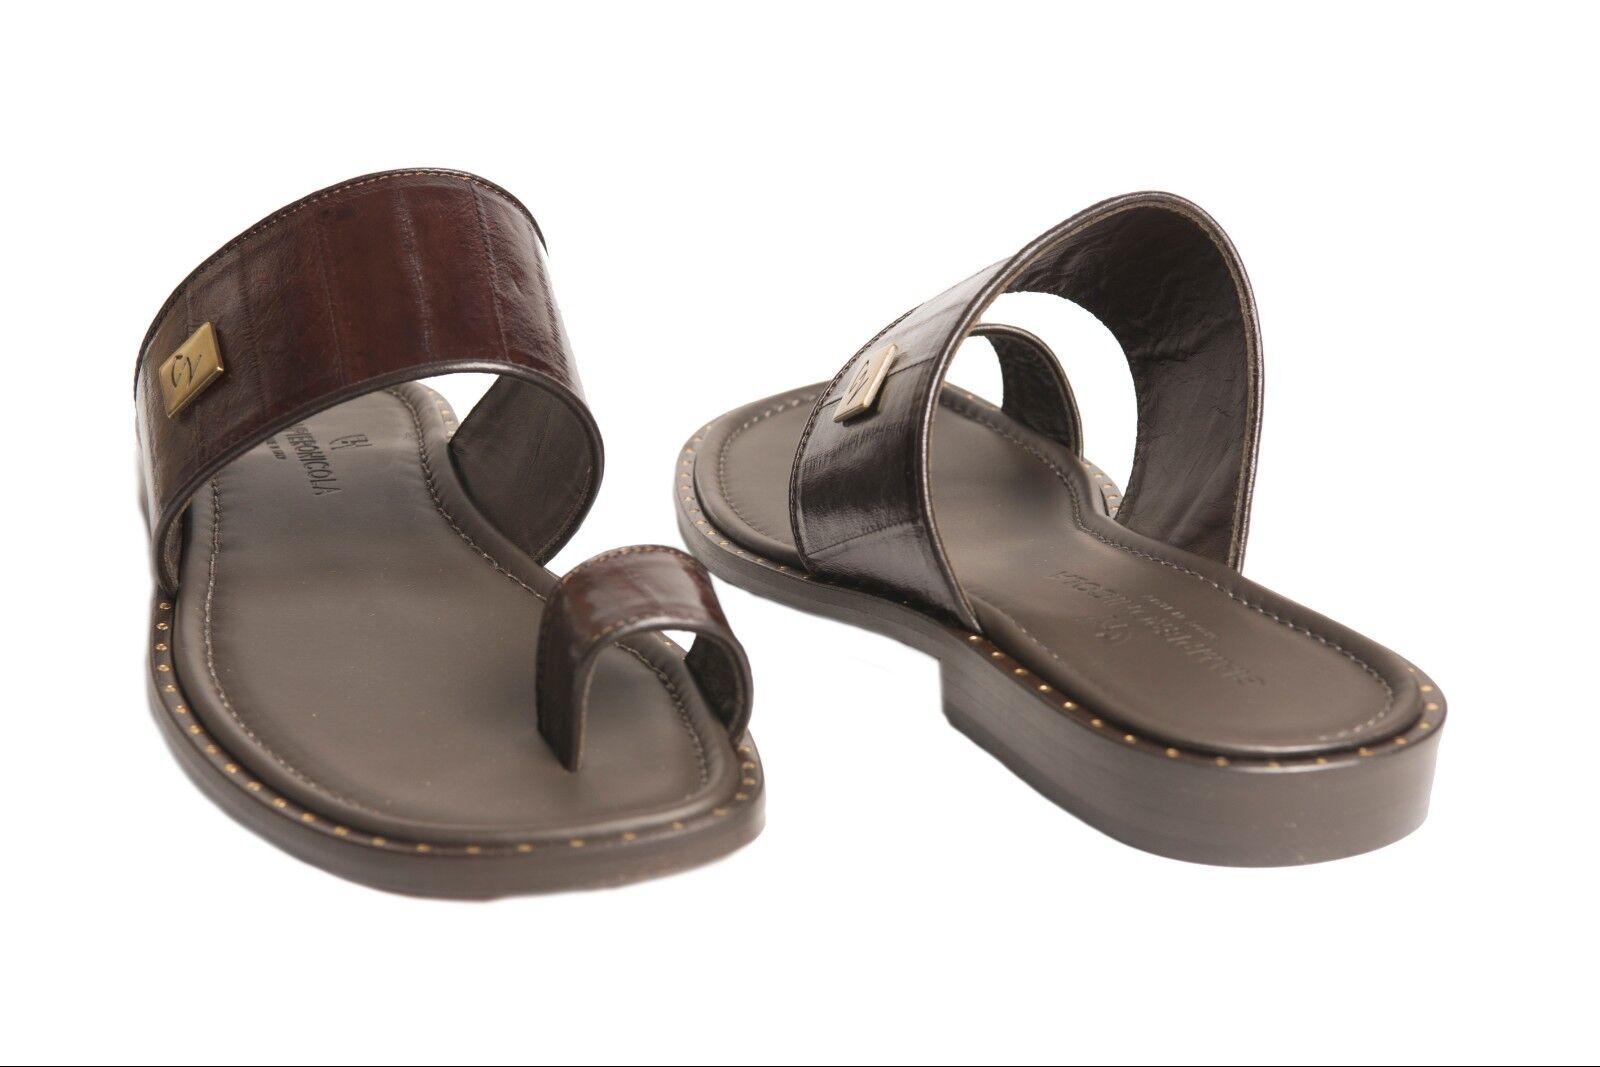 Giampieronicola 5023 Italian mens Marroneee eel skin push-in-toe sandals